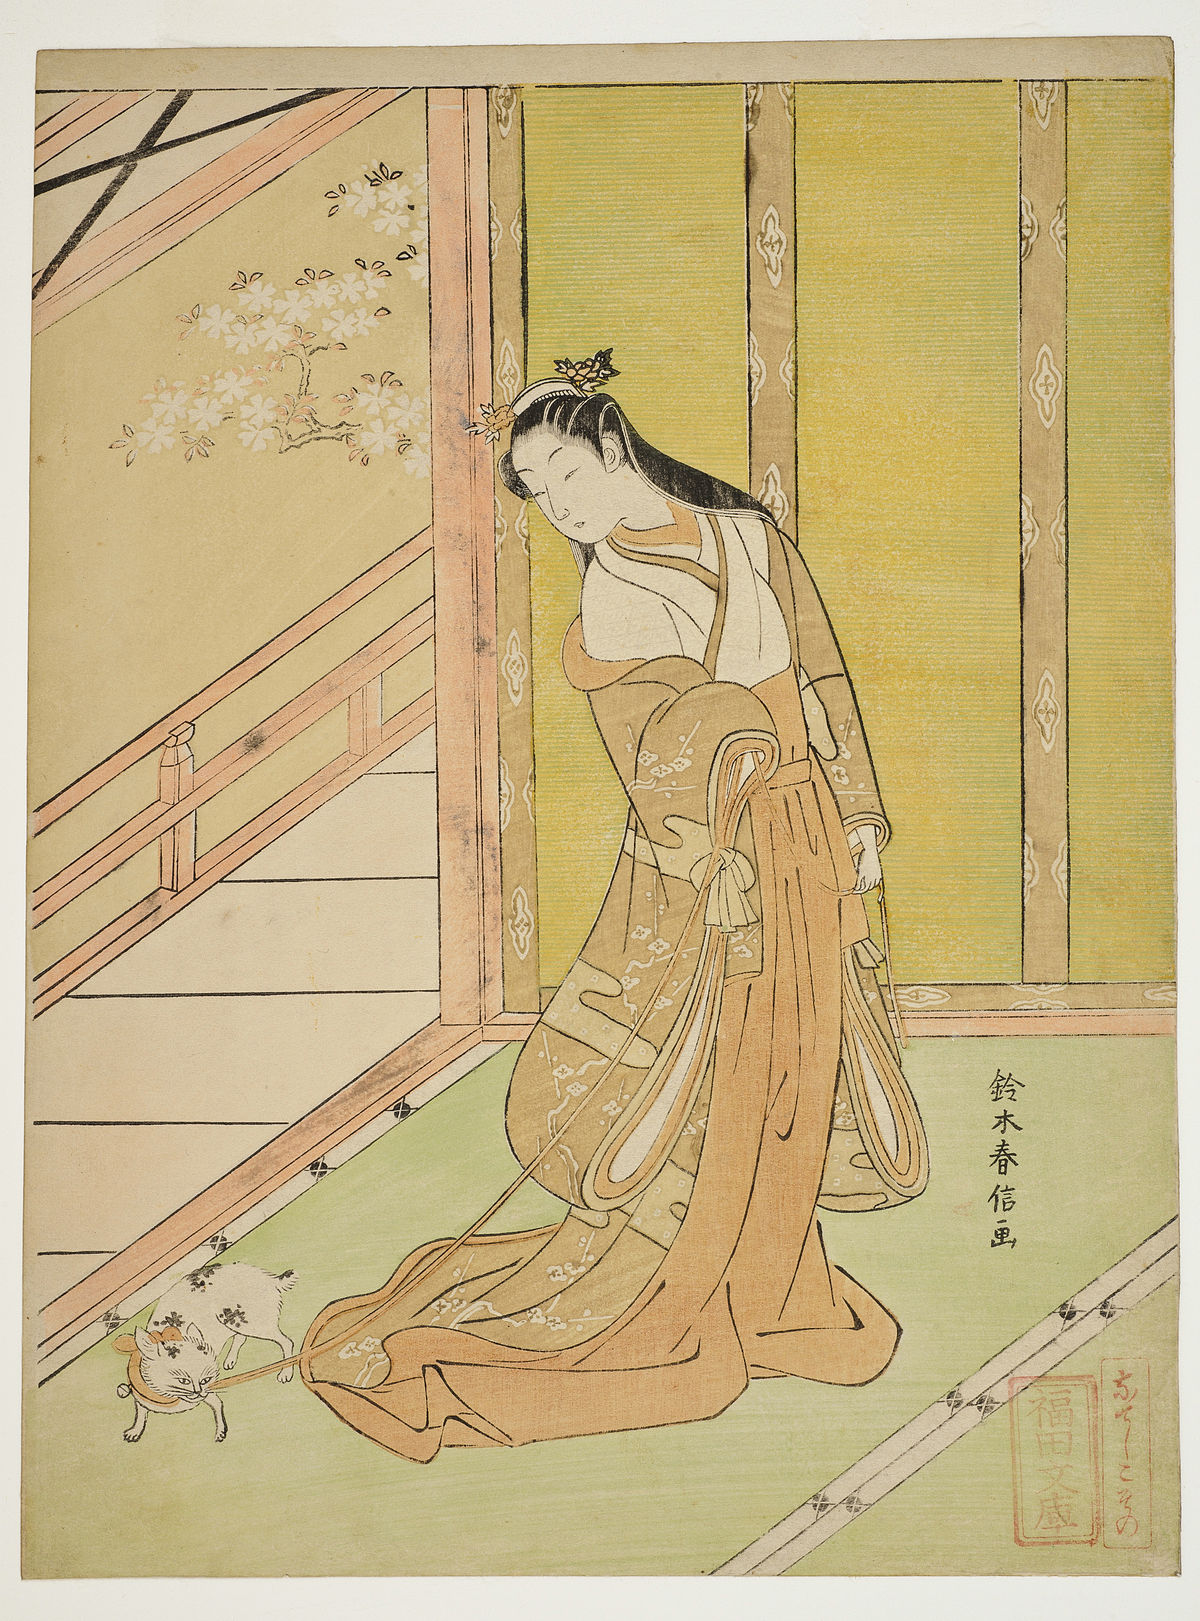 The Tale of Genji, by Murasaki Shikibu